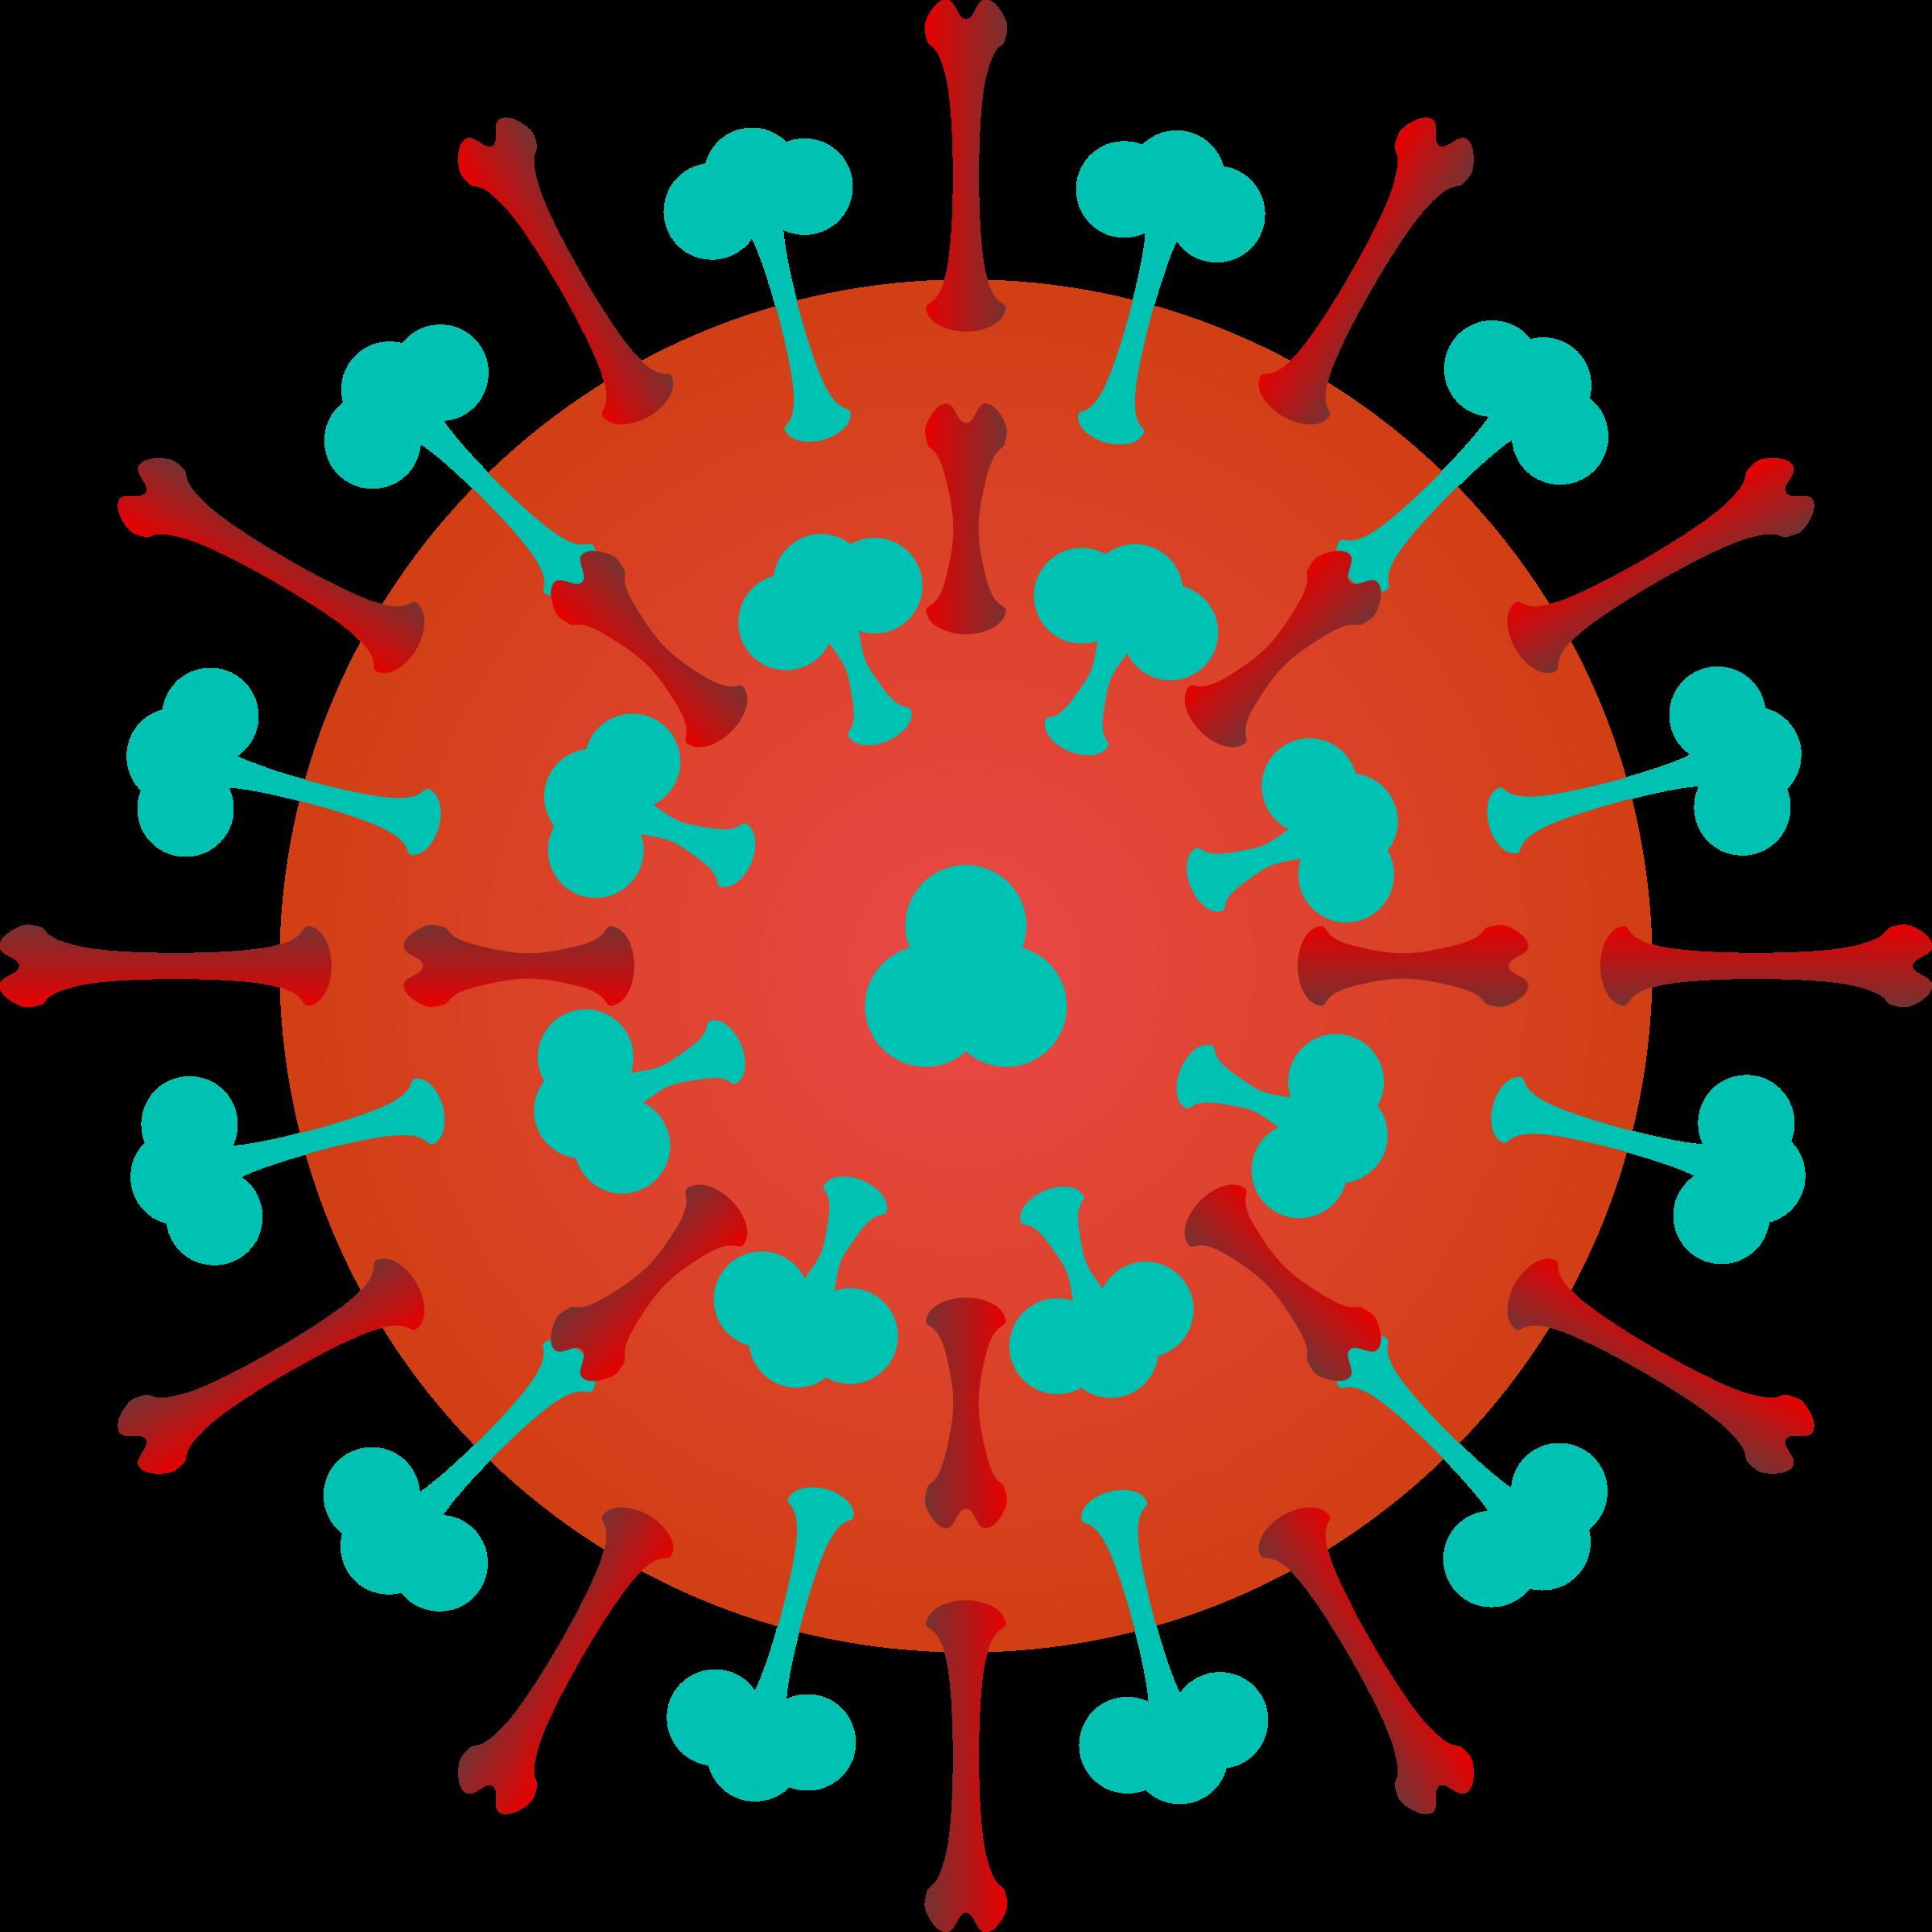 2400x2400 Bacteria Clipart Flu Virus